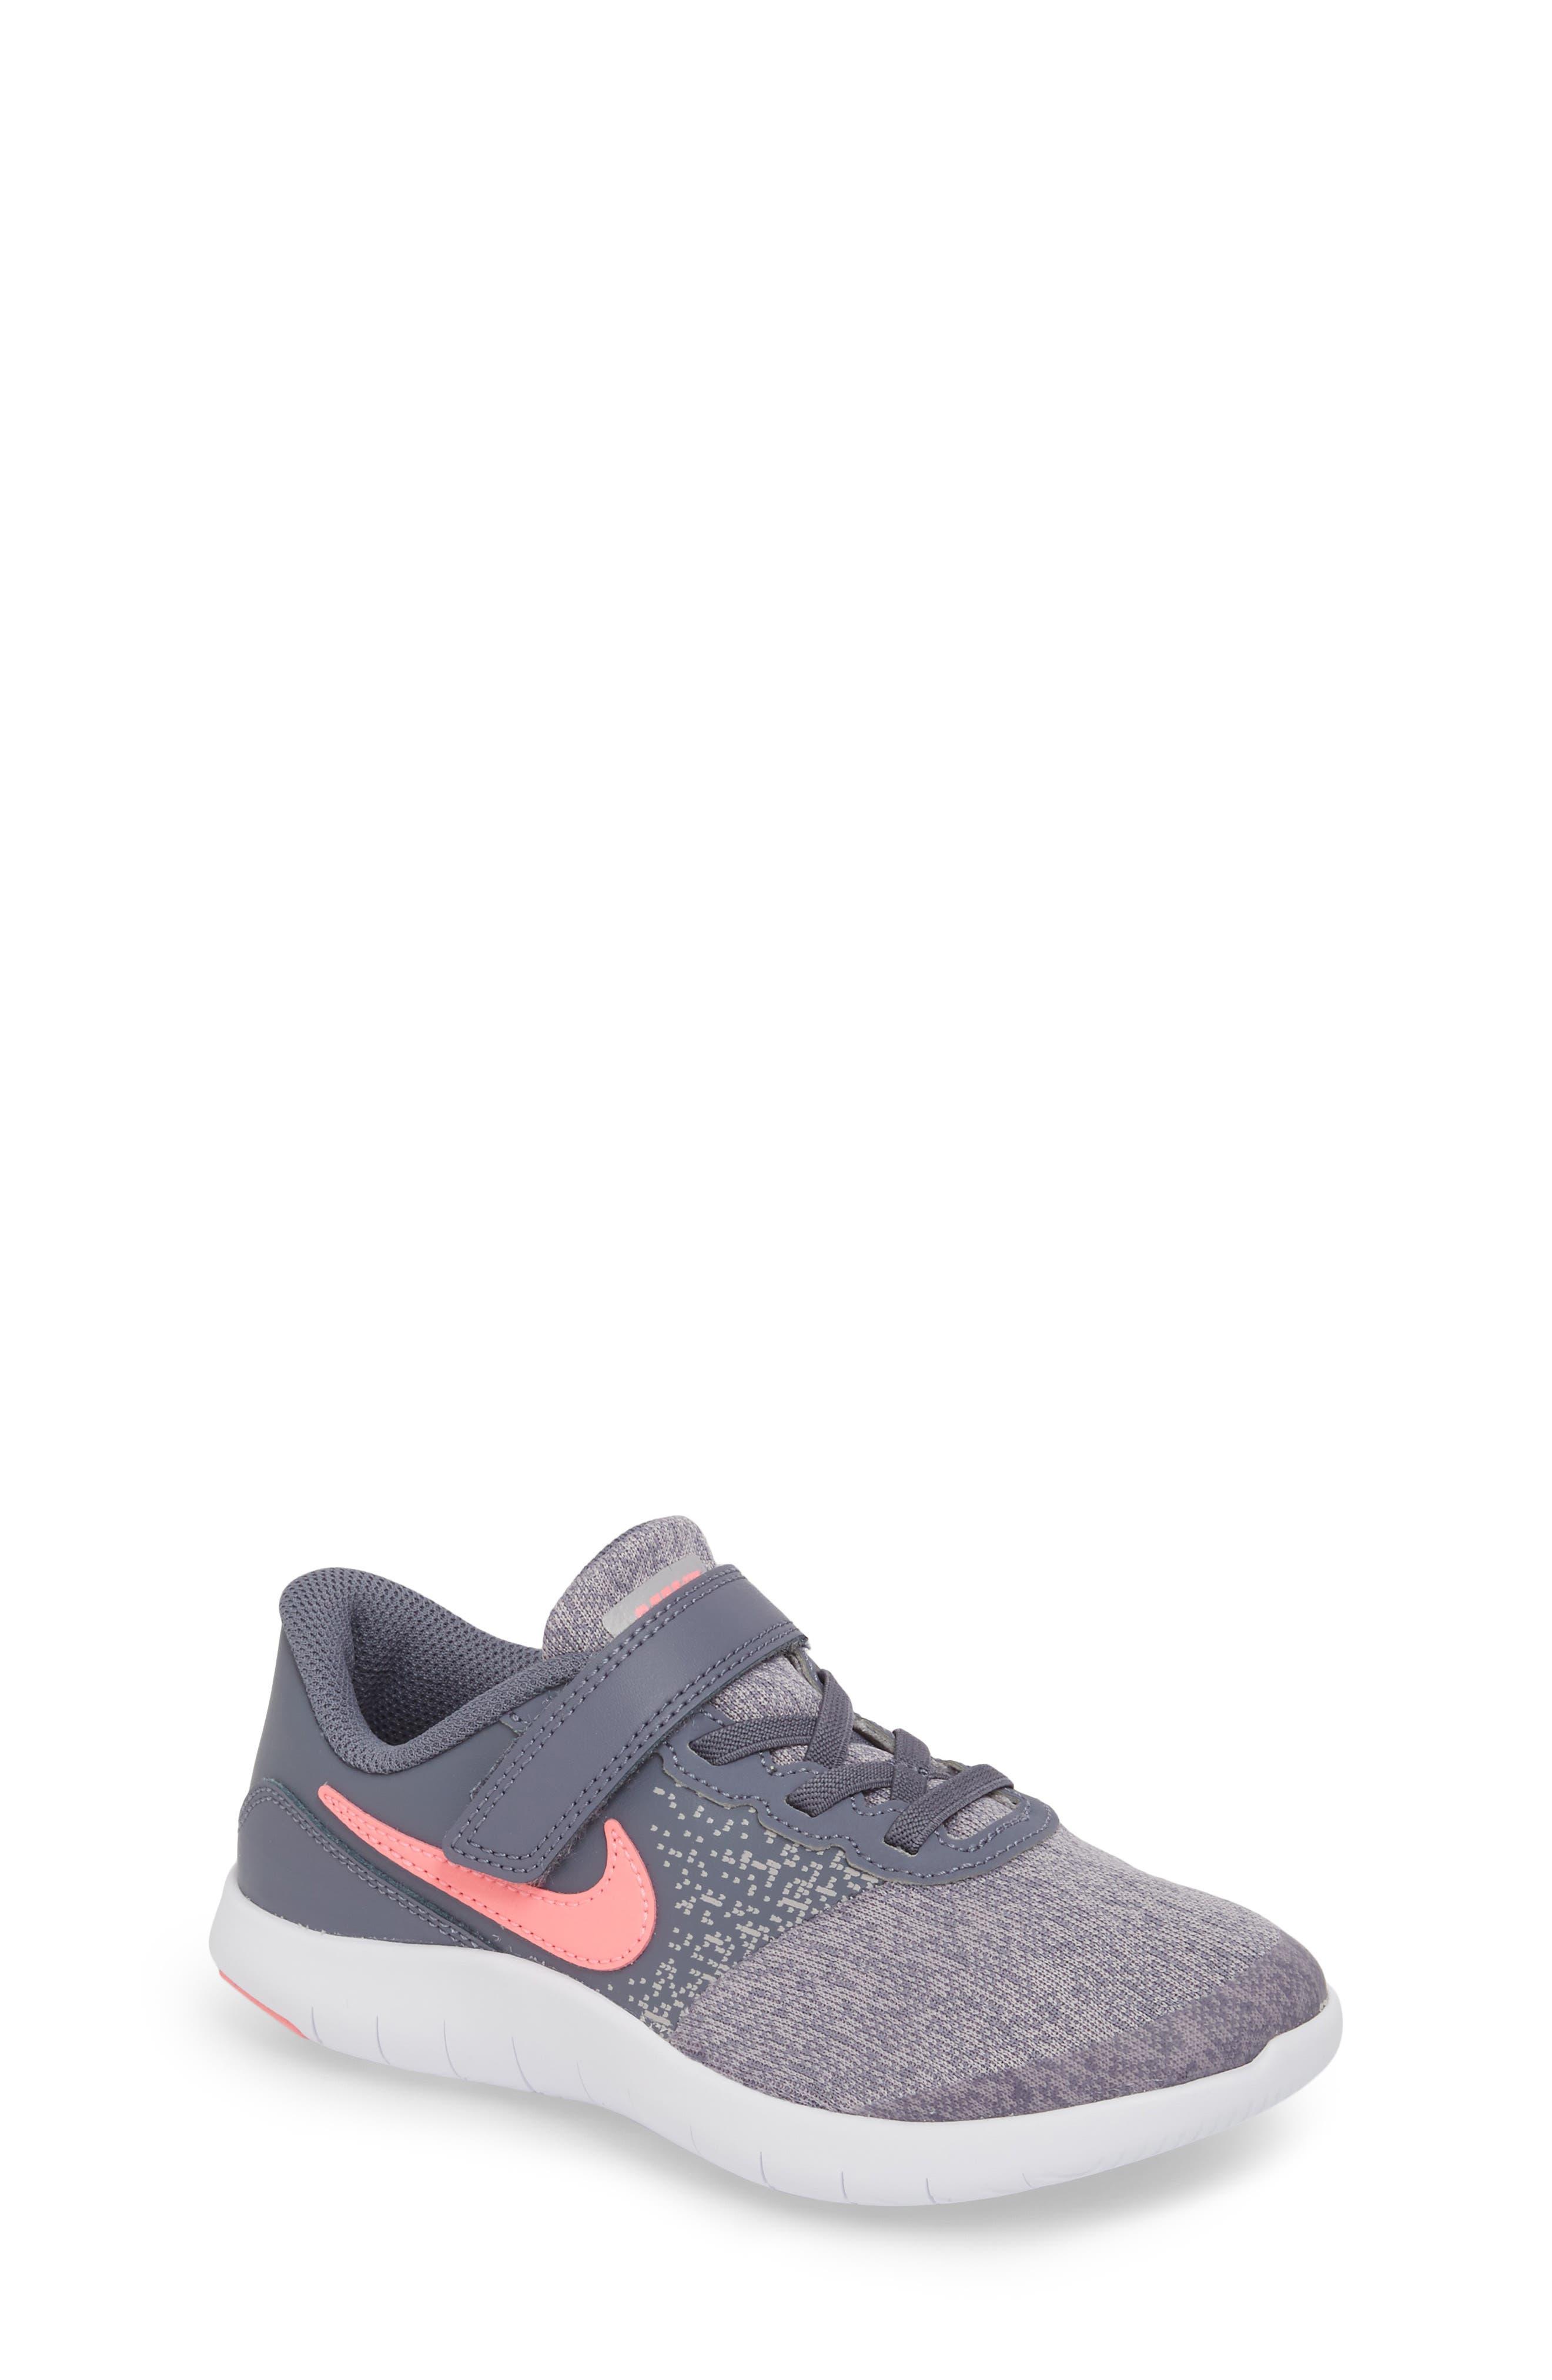 All Girls' Nike Grey Baby & Walker Shoes Nordstrom